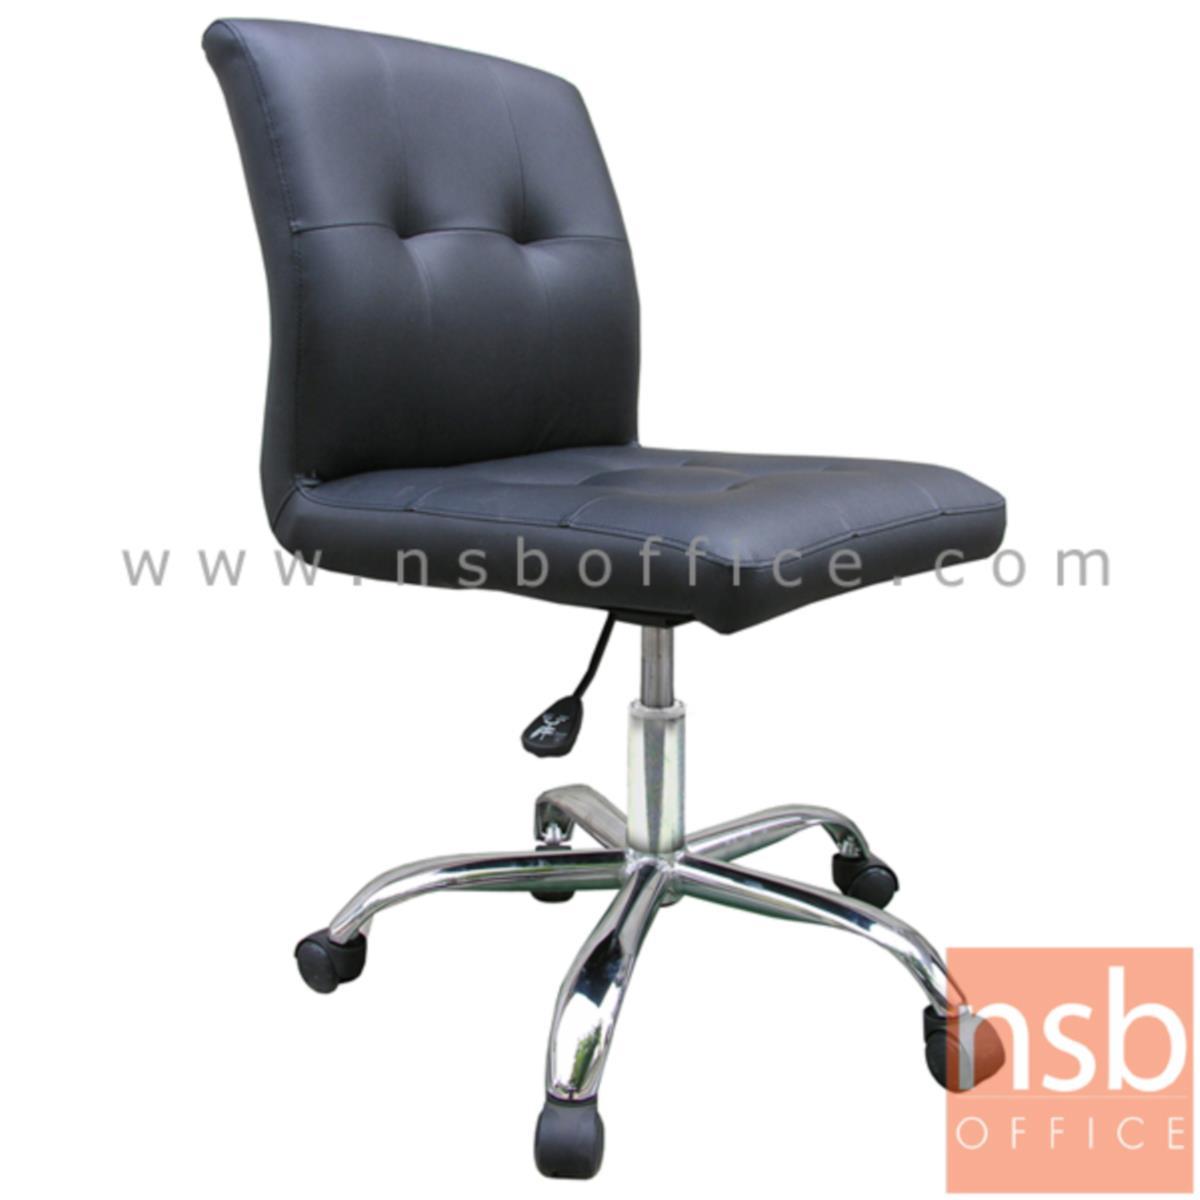 B03A432:เก้าอี้สำนักงาน รุ่น Peabo (พีโบ)  ระบบ Gas Lifthing ขาเหล็กชุบโครเมี่ยม